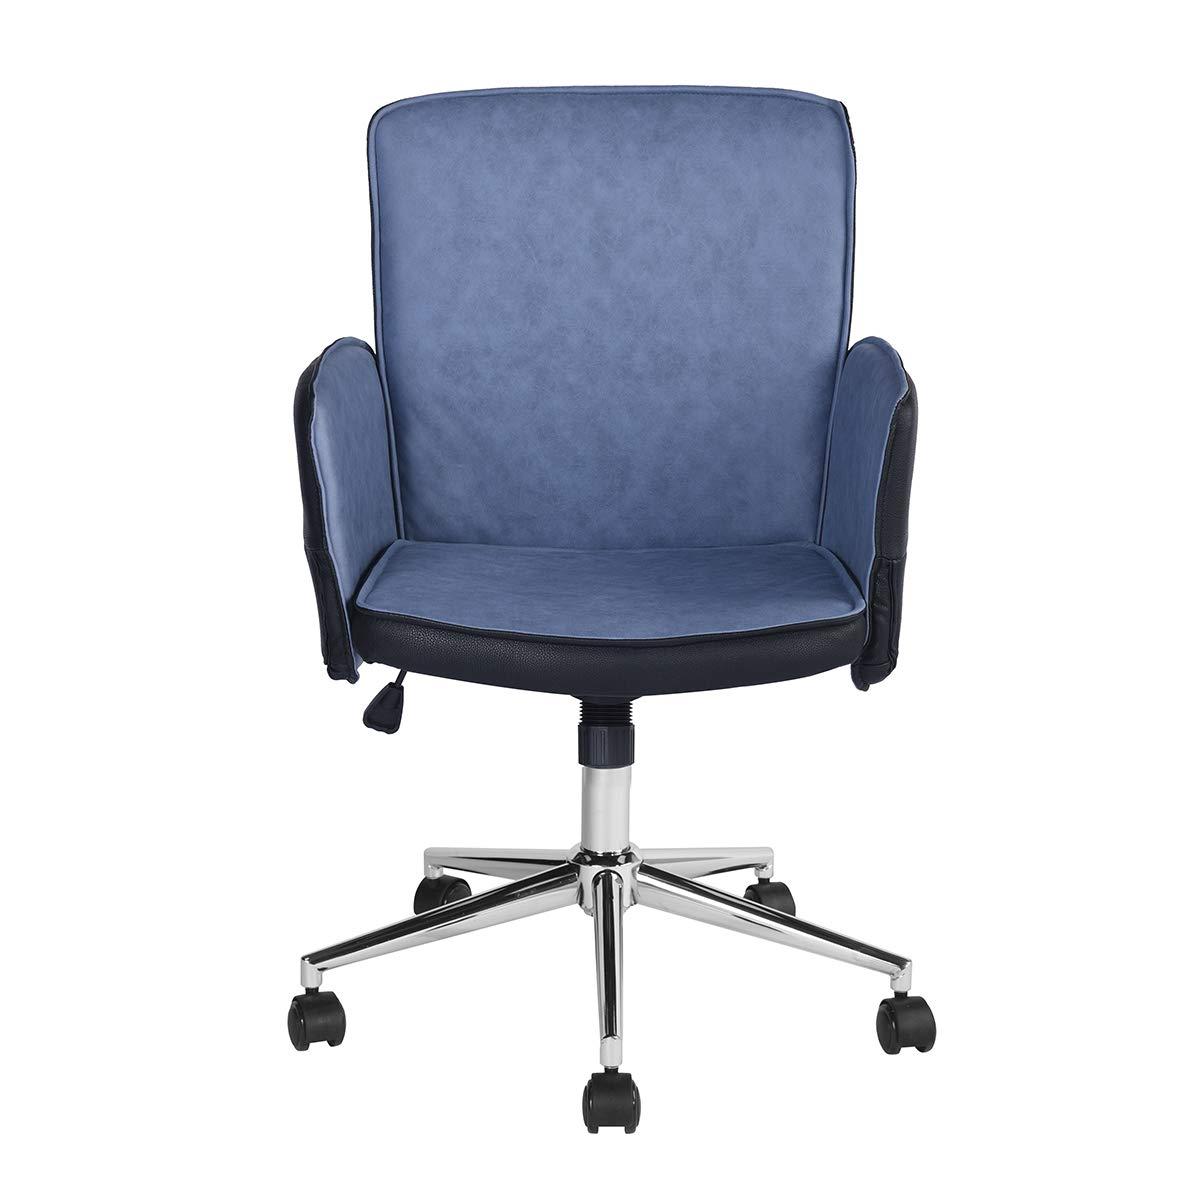 House in Box Secretary Office Chair Mesh Armrest Chrome Metal Adjustable Height Swivel Castors